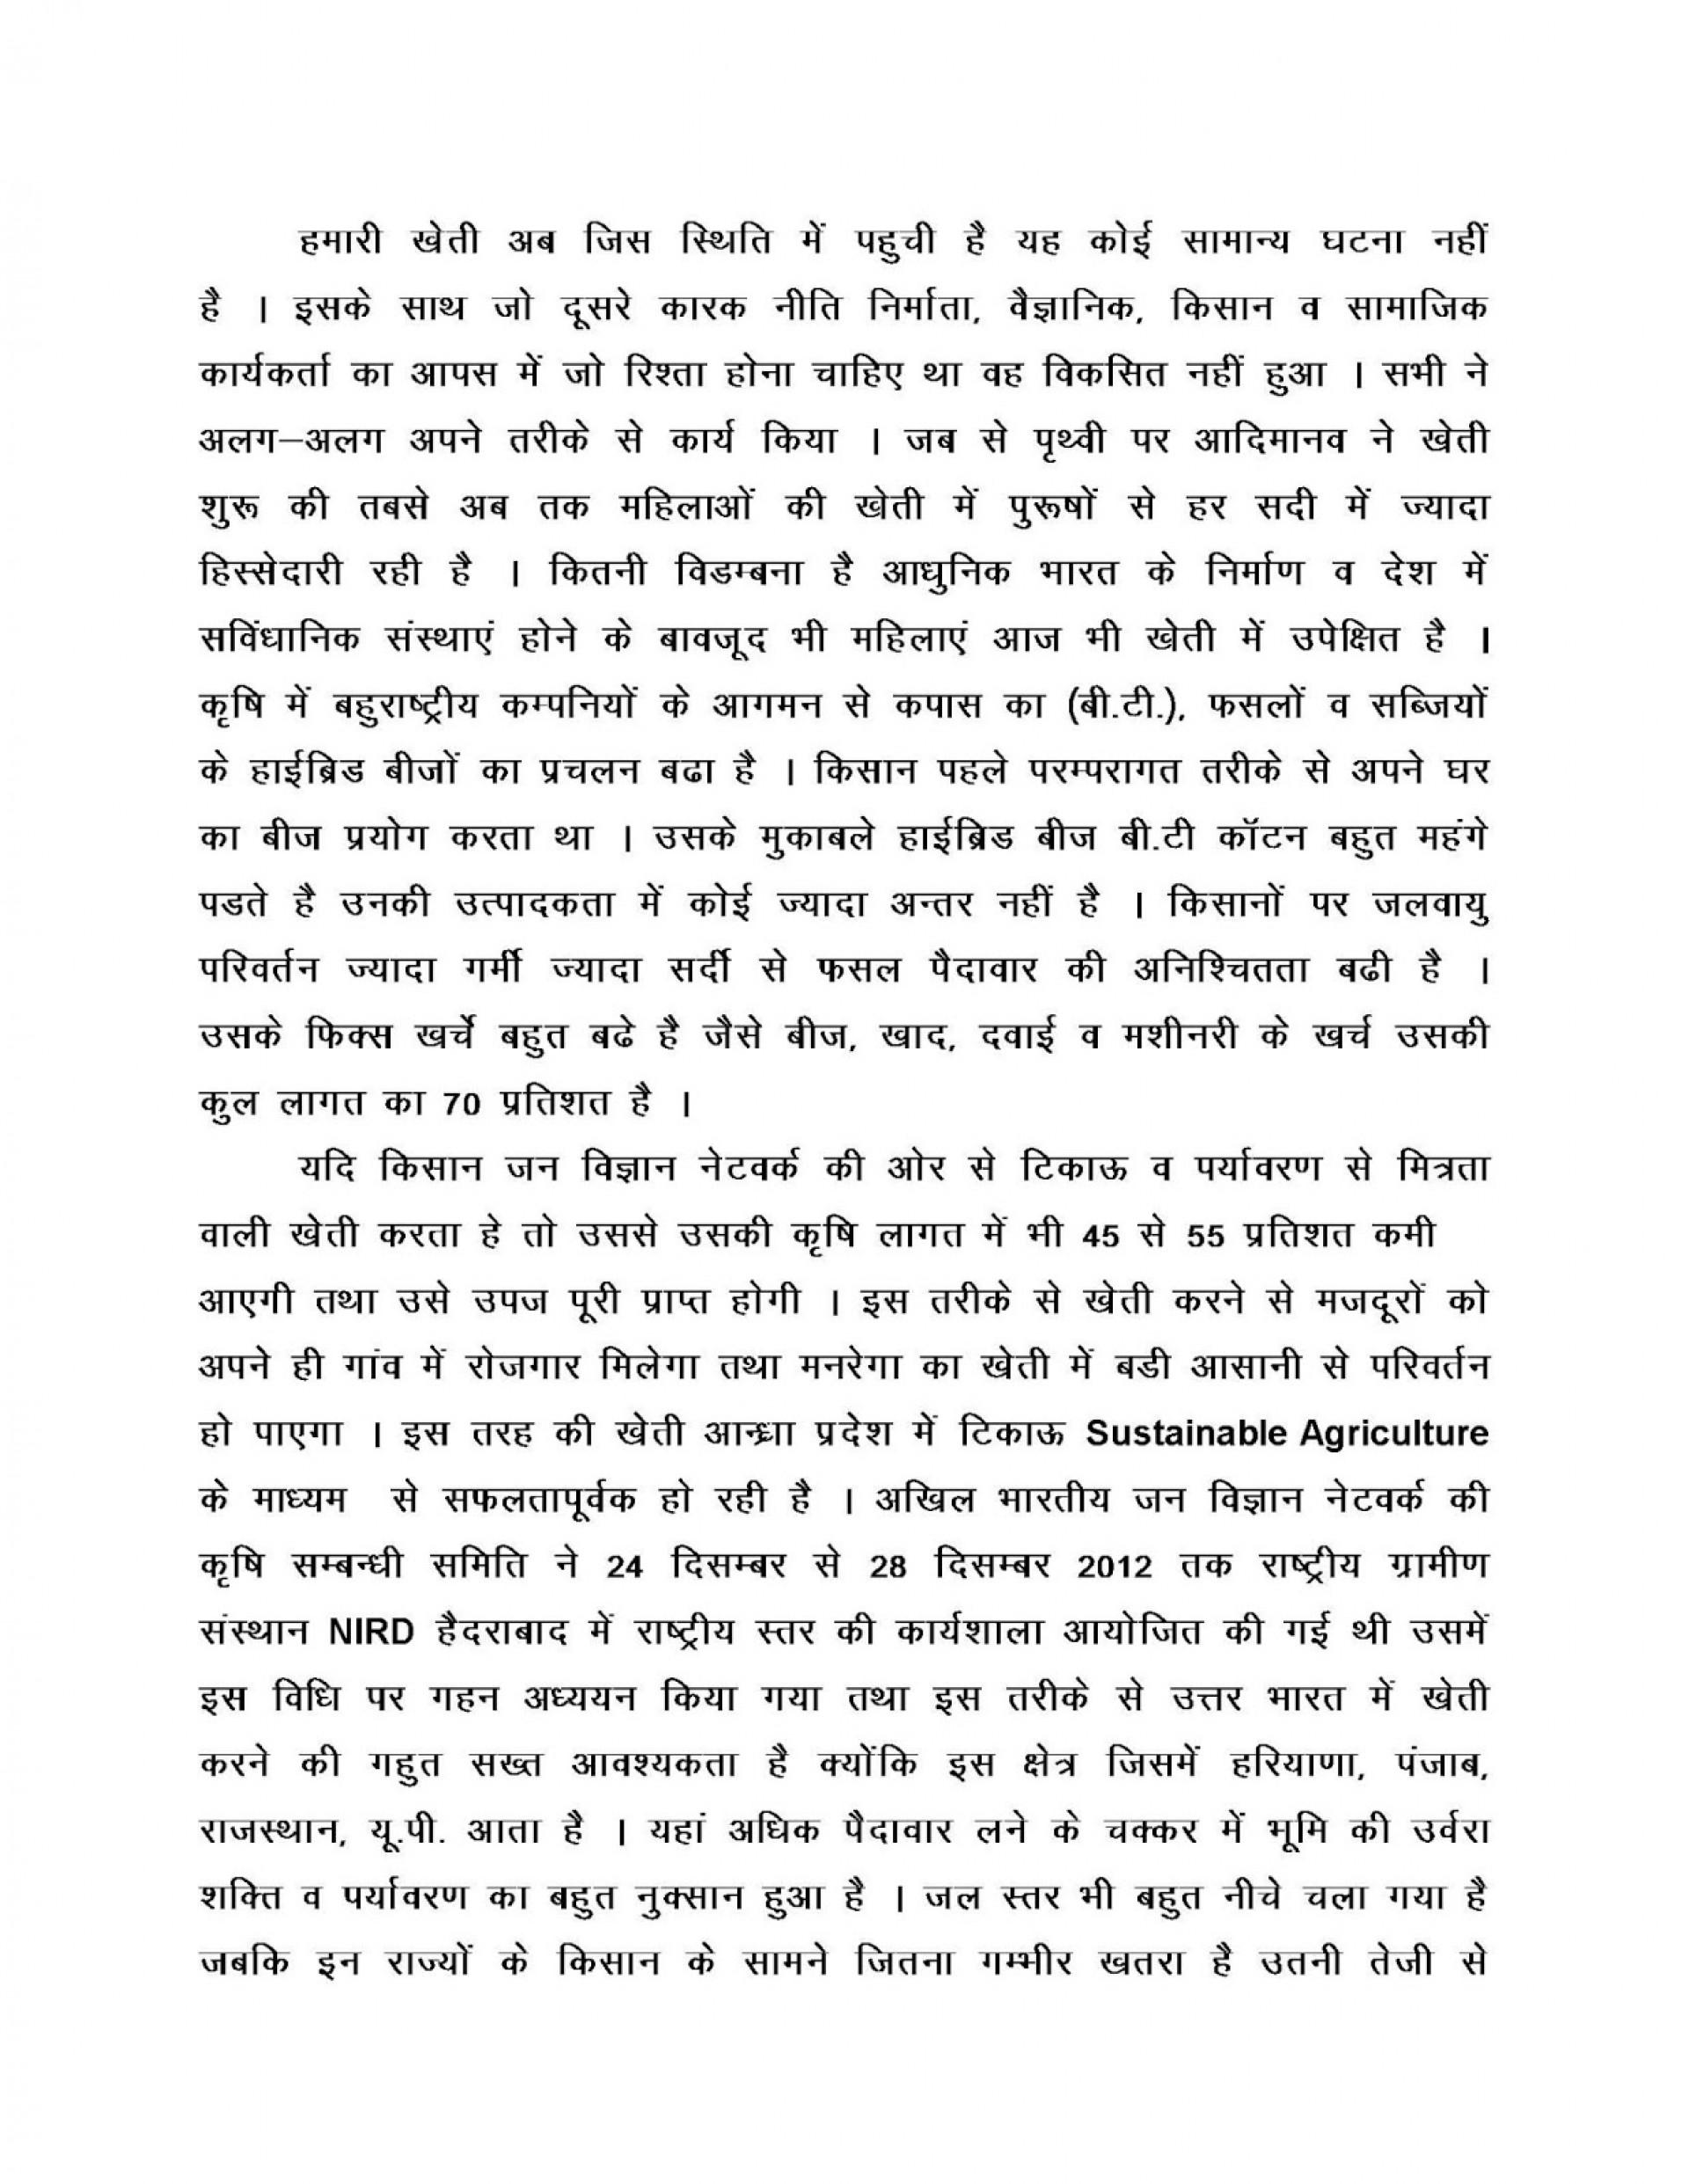 008 Gender Equality Essay Example Hindiworkdr Rajindersingh Page 3 Top Research Paper Ideas Argumentative Pdf In Simple Words 1920